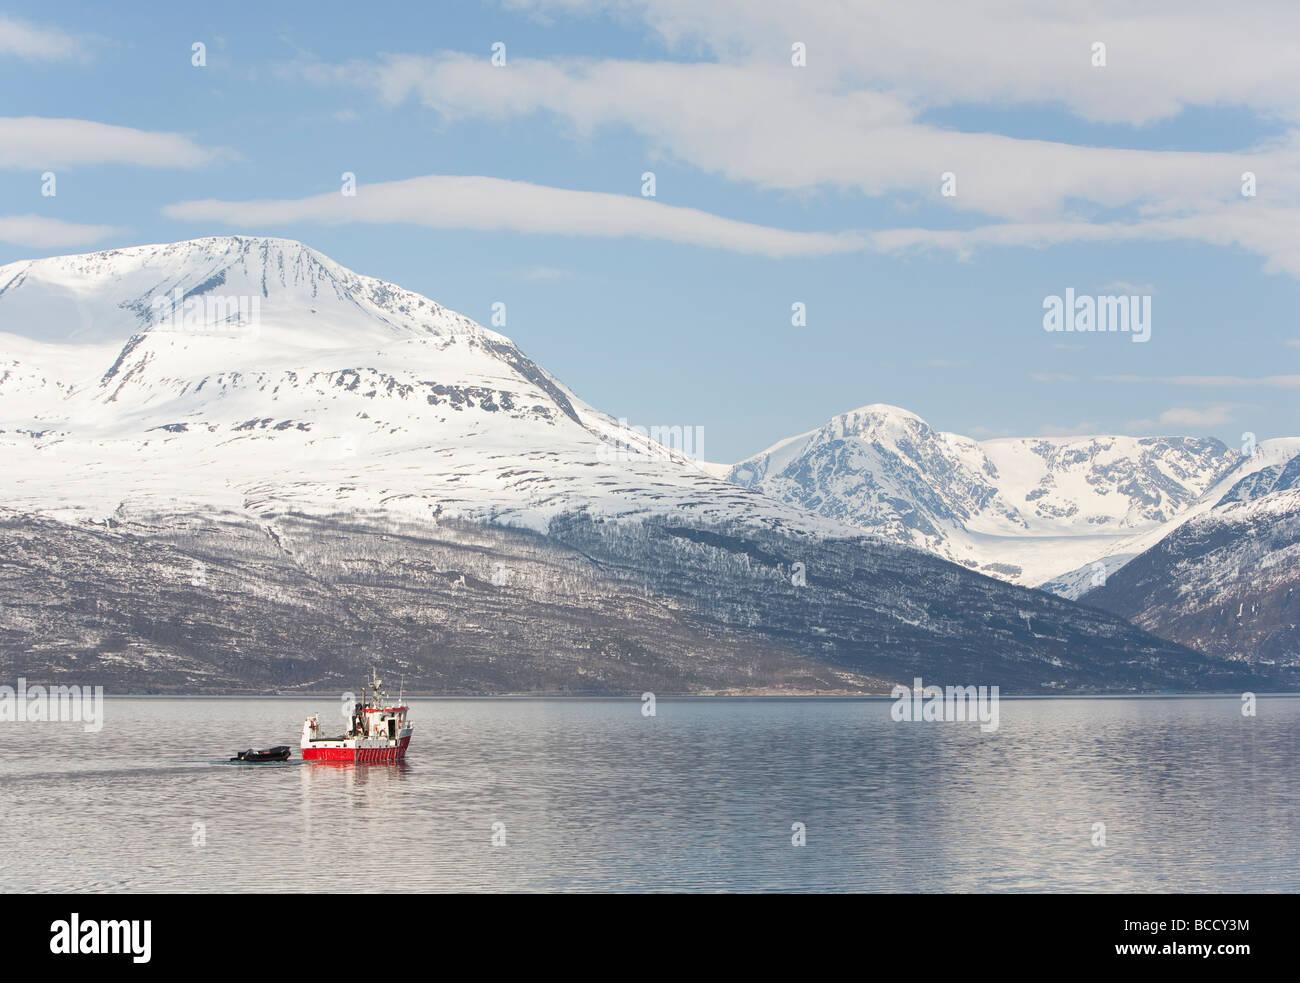 Small Norwegian fishing boat at Storfjord Skibotn Norway - Stock Image